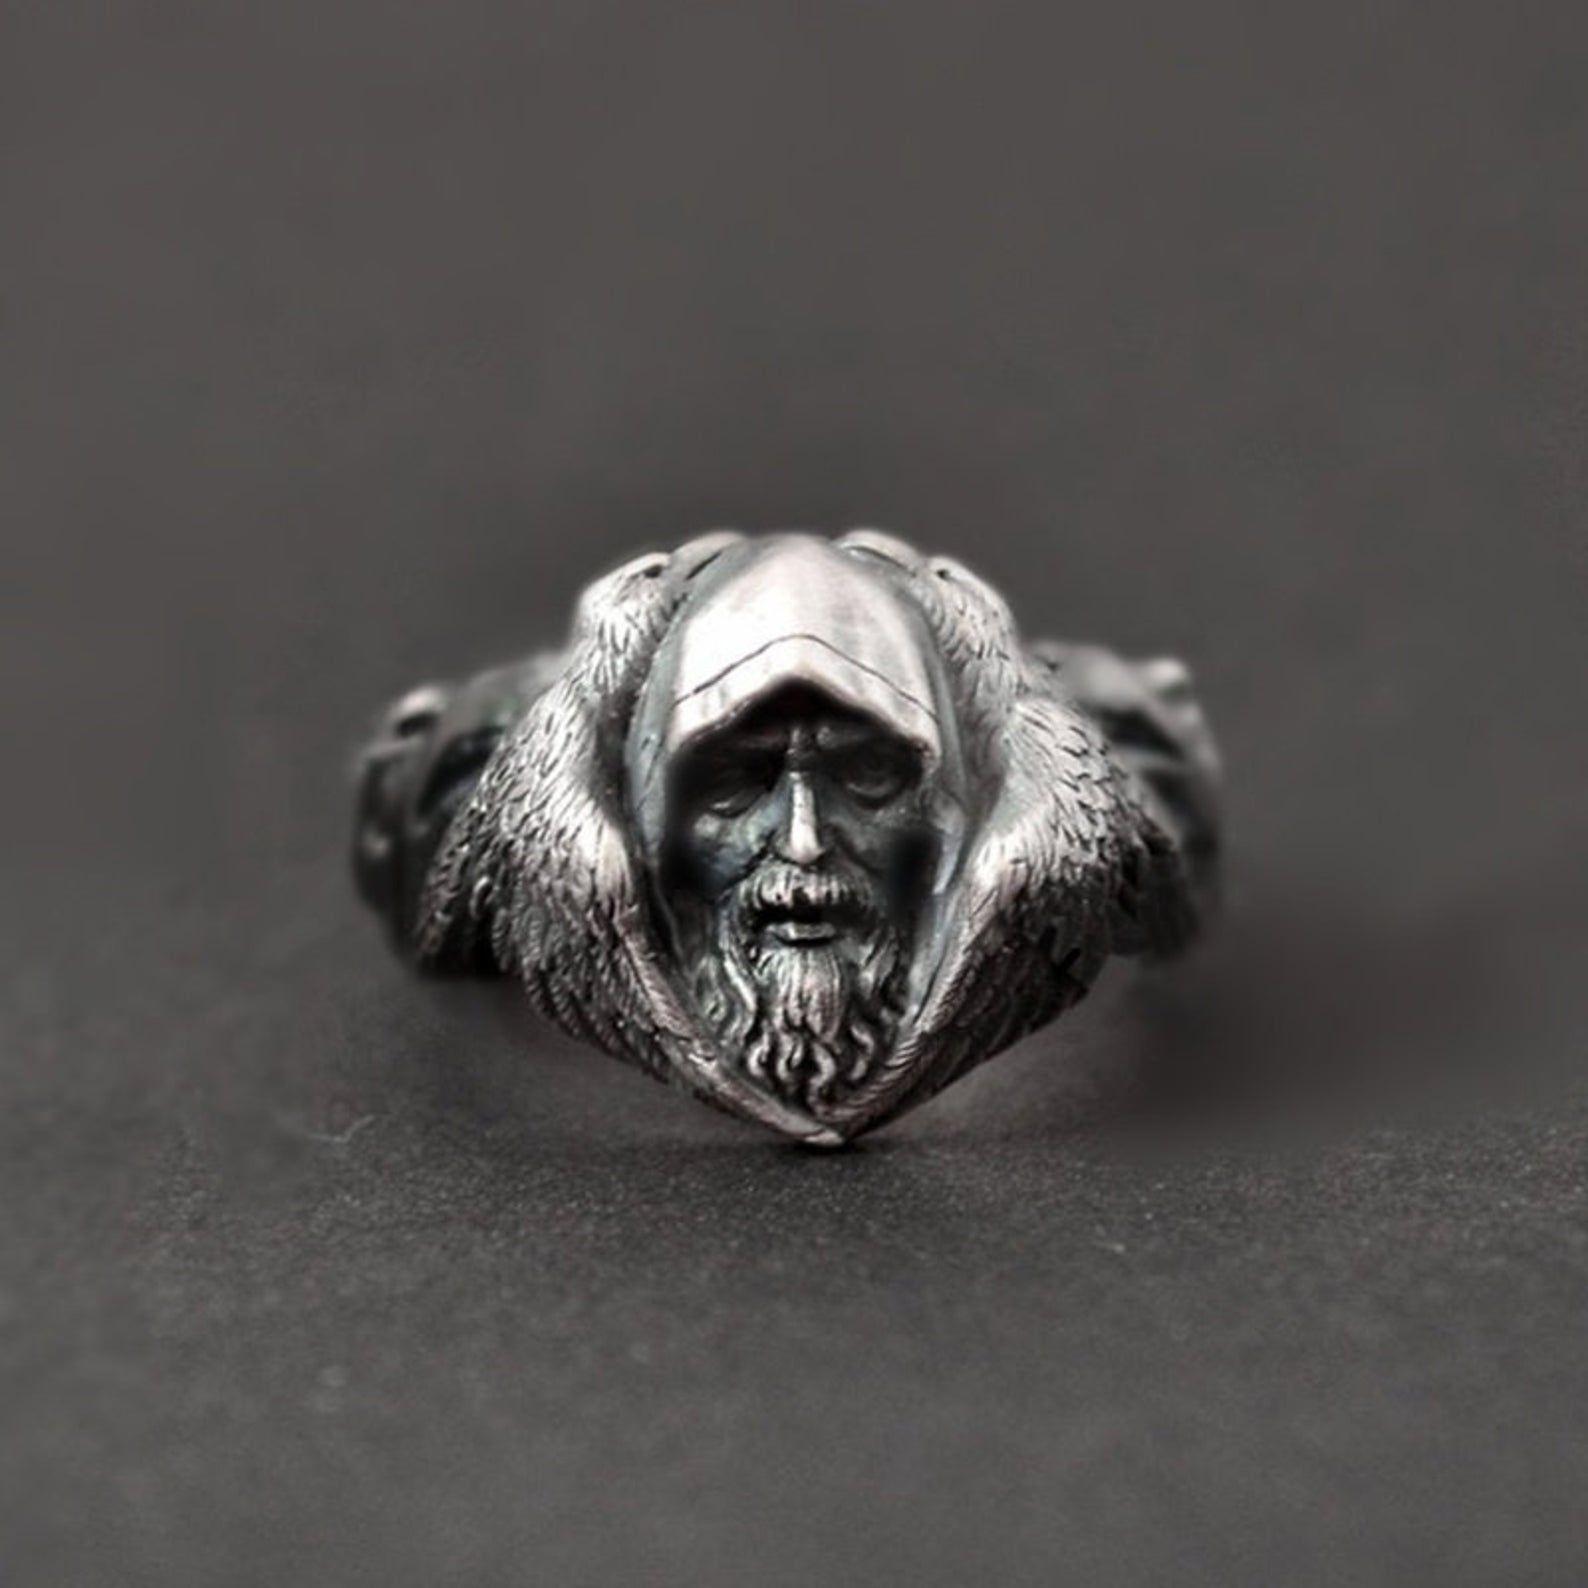 Odin Raven Silver Rings, Men Viking Wolf Stainless Steel